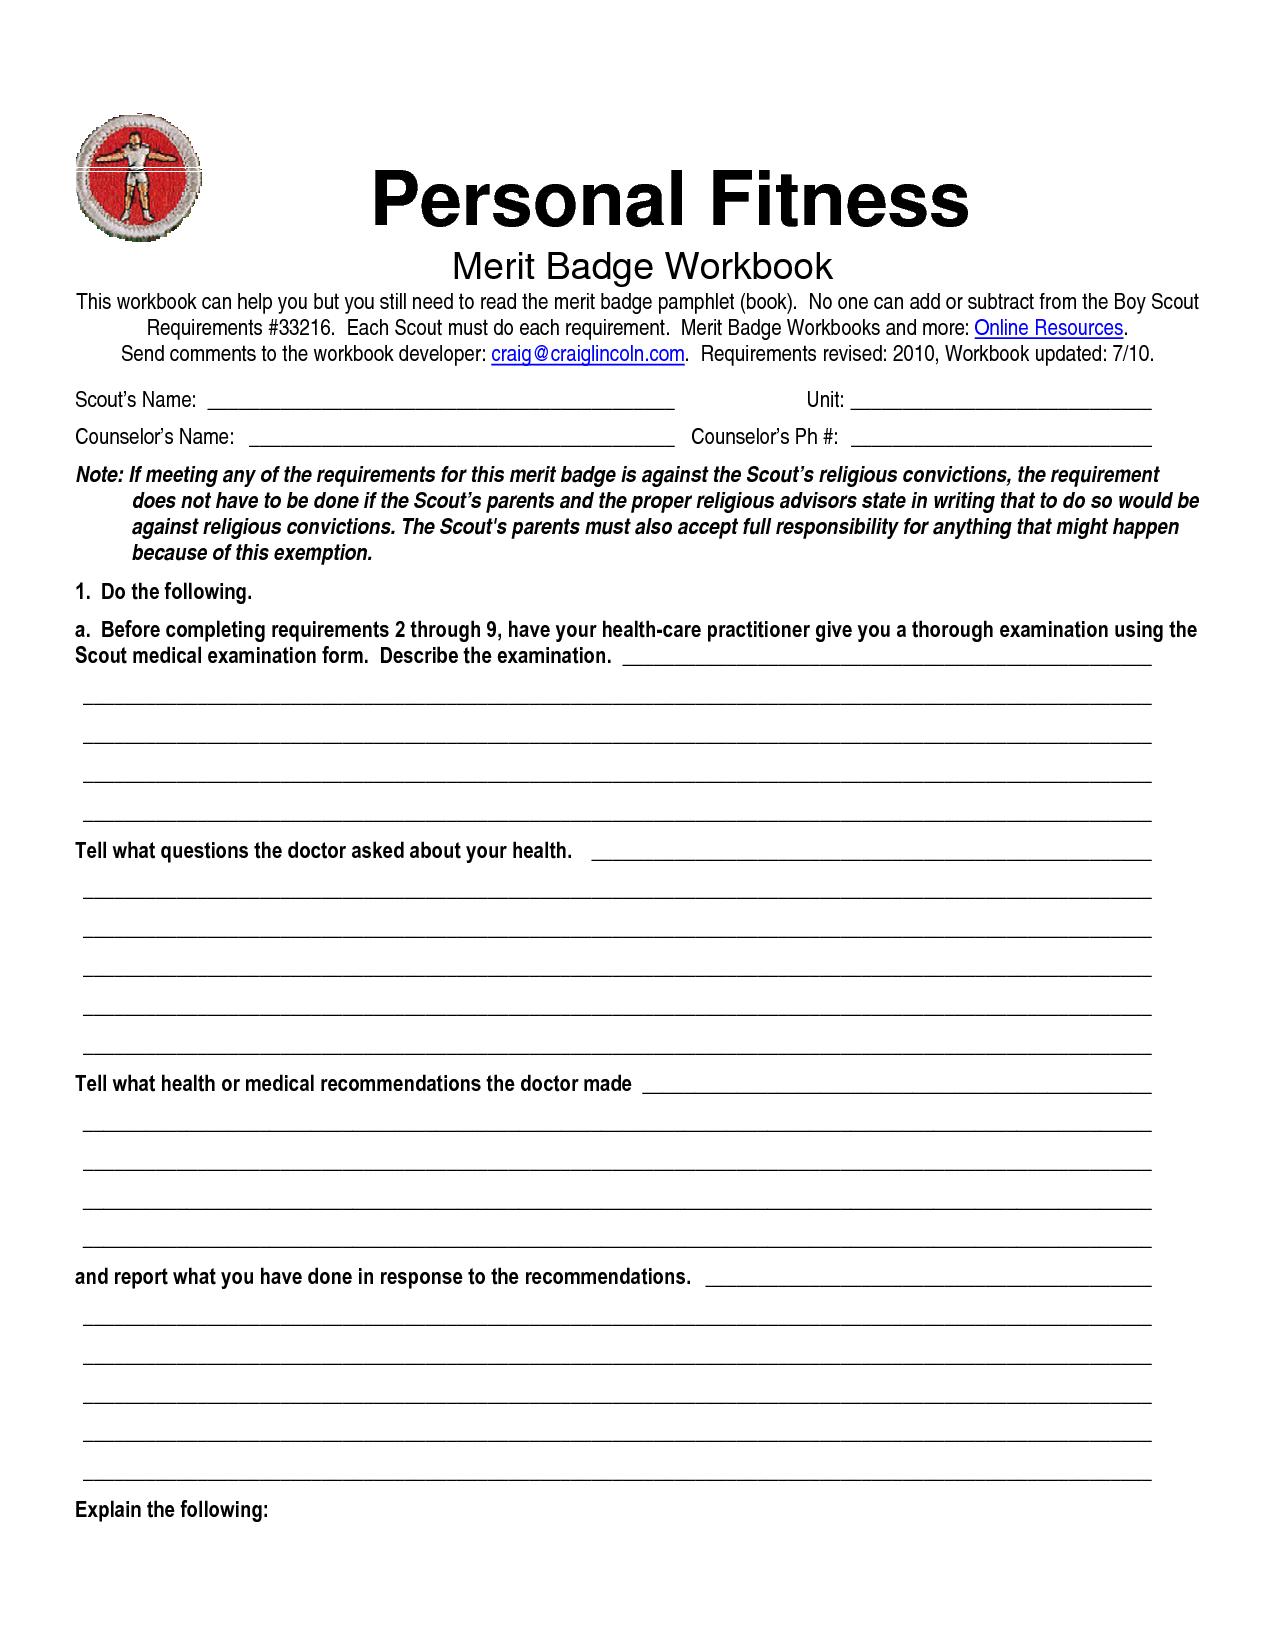 Family Life Merit Badge Worksheet Answers   db excel.com